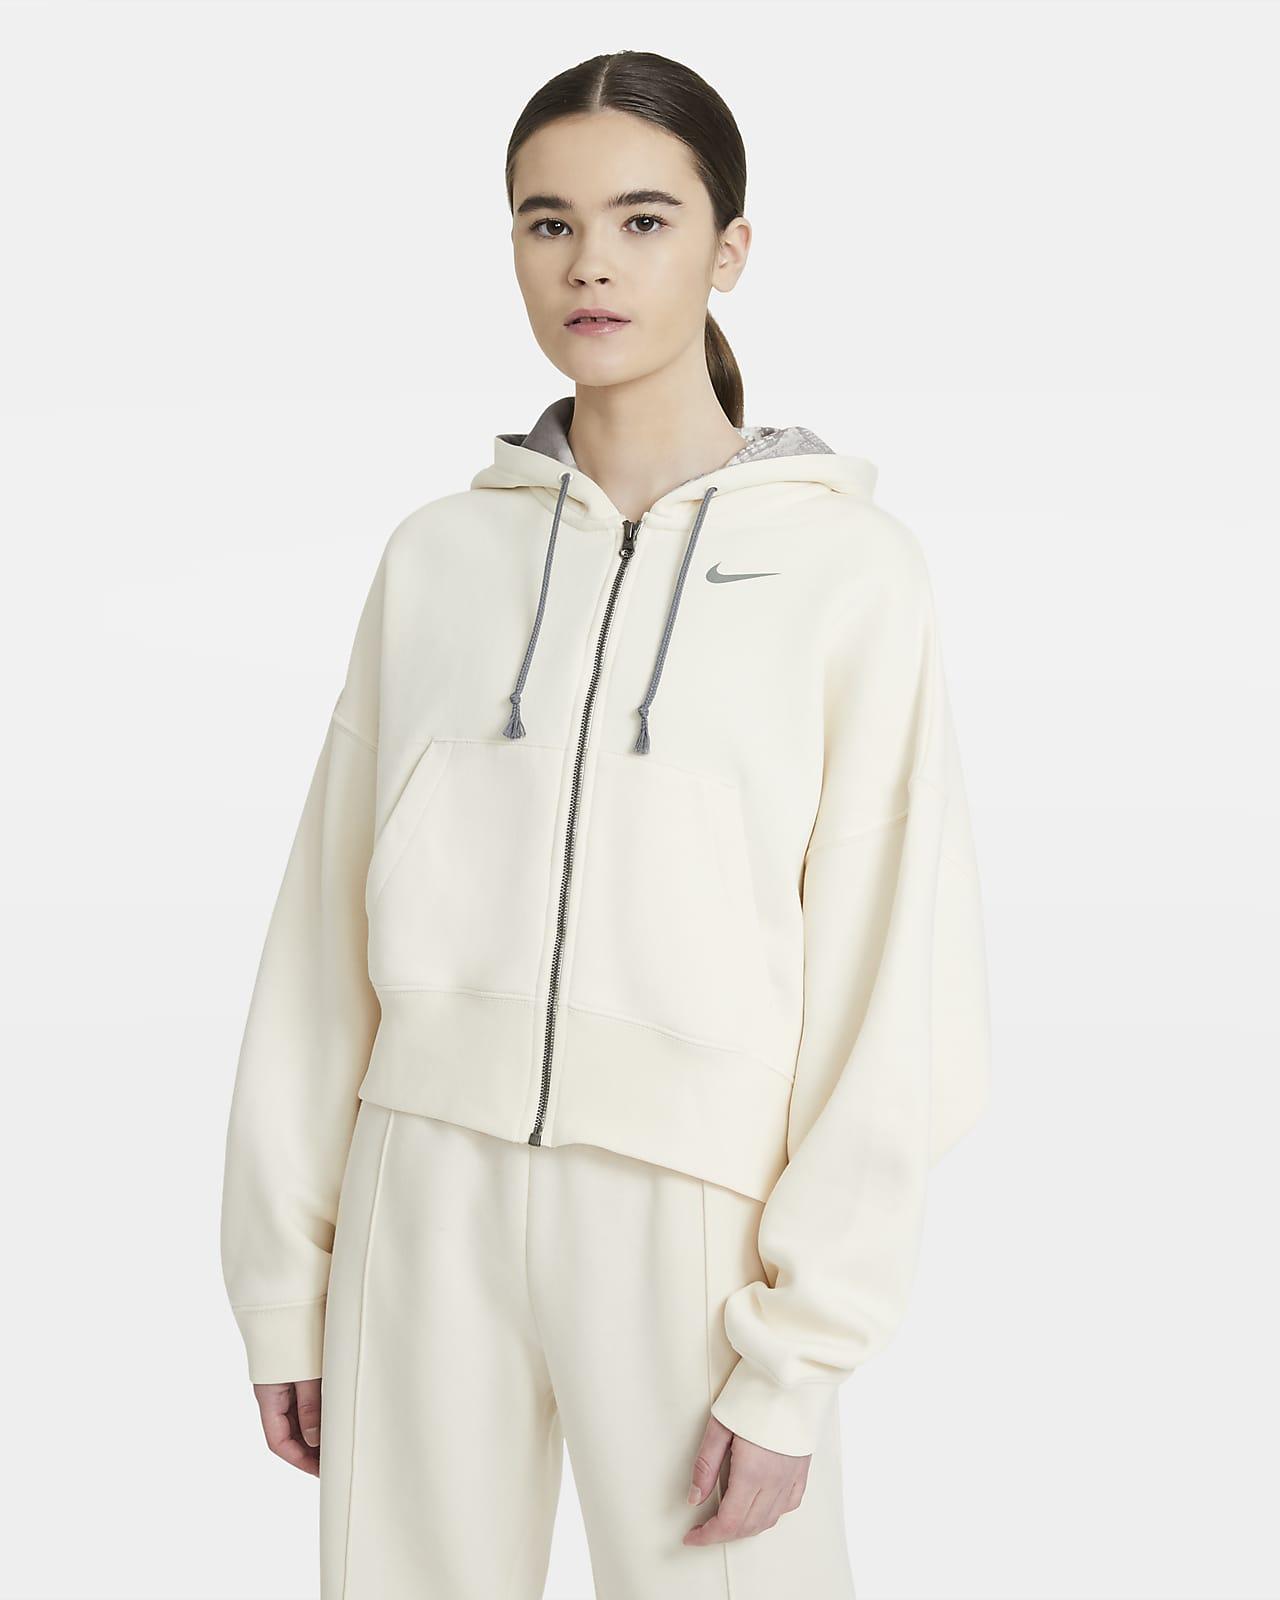 Nike Sportswear Air Max Women's Full-Zip Fleece Hoodie